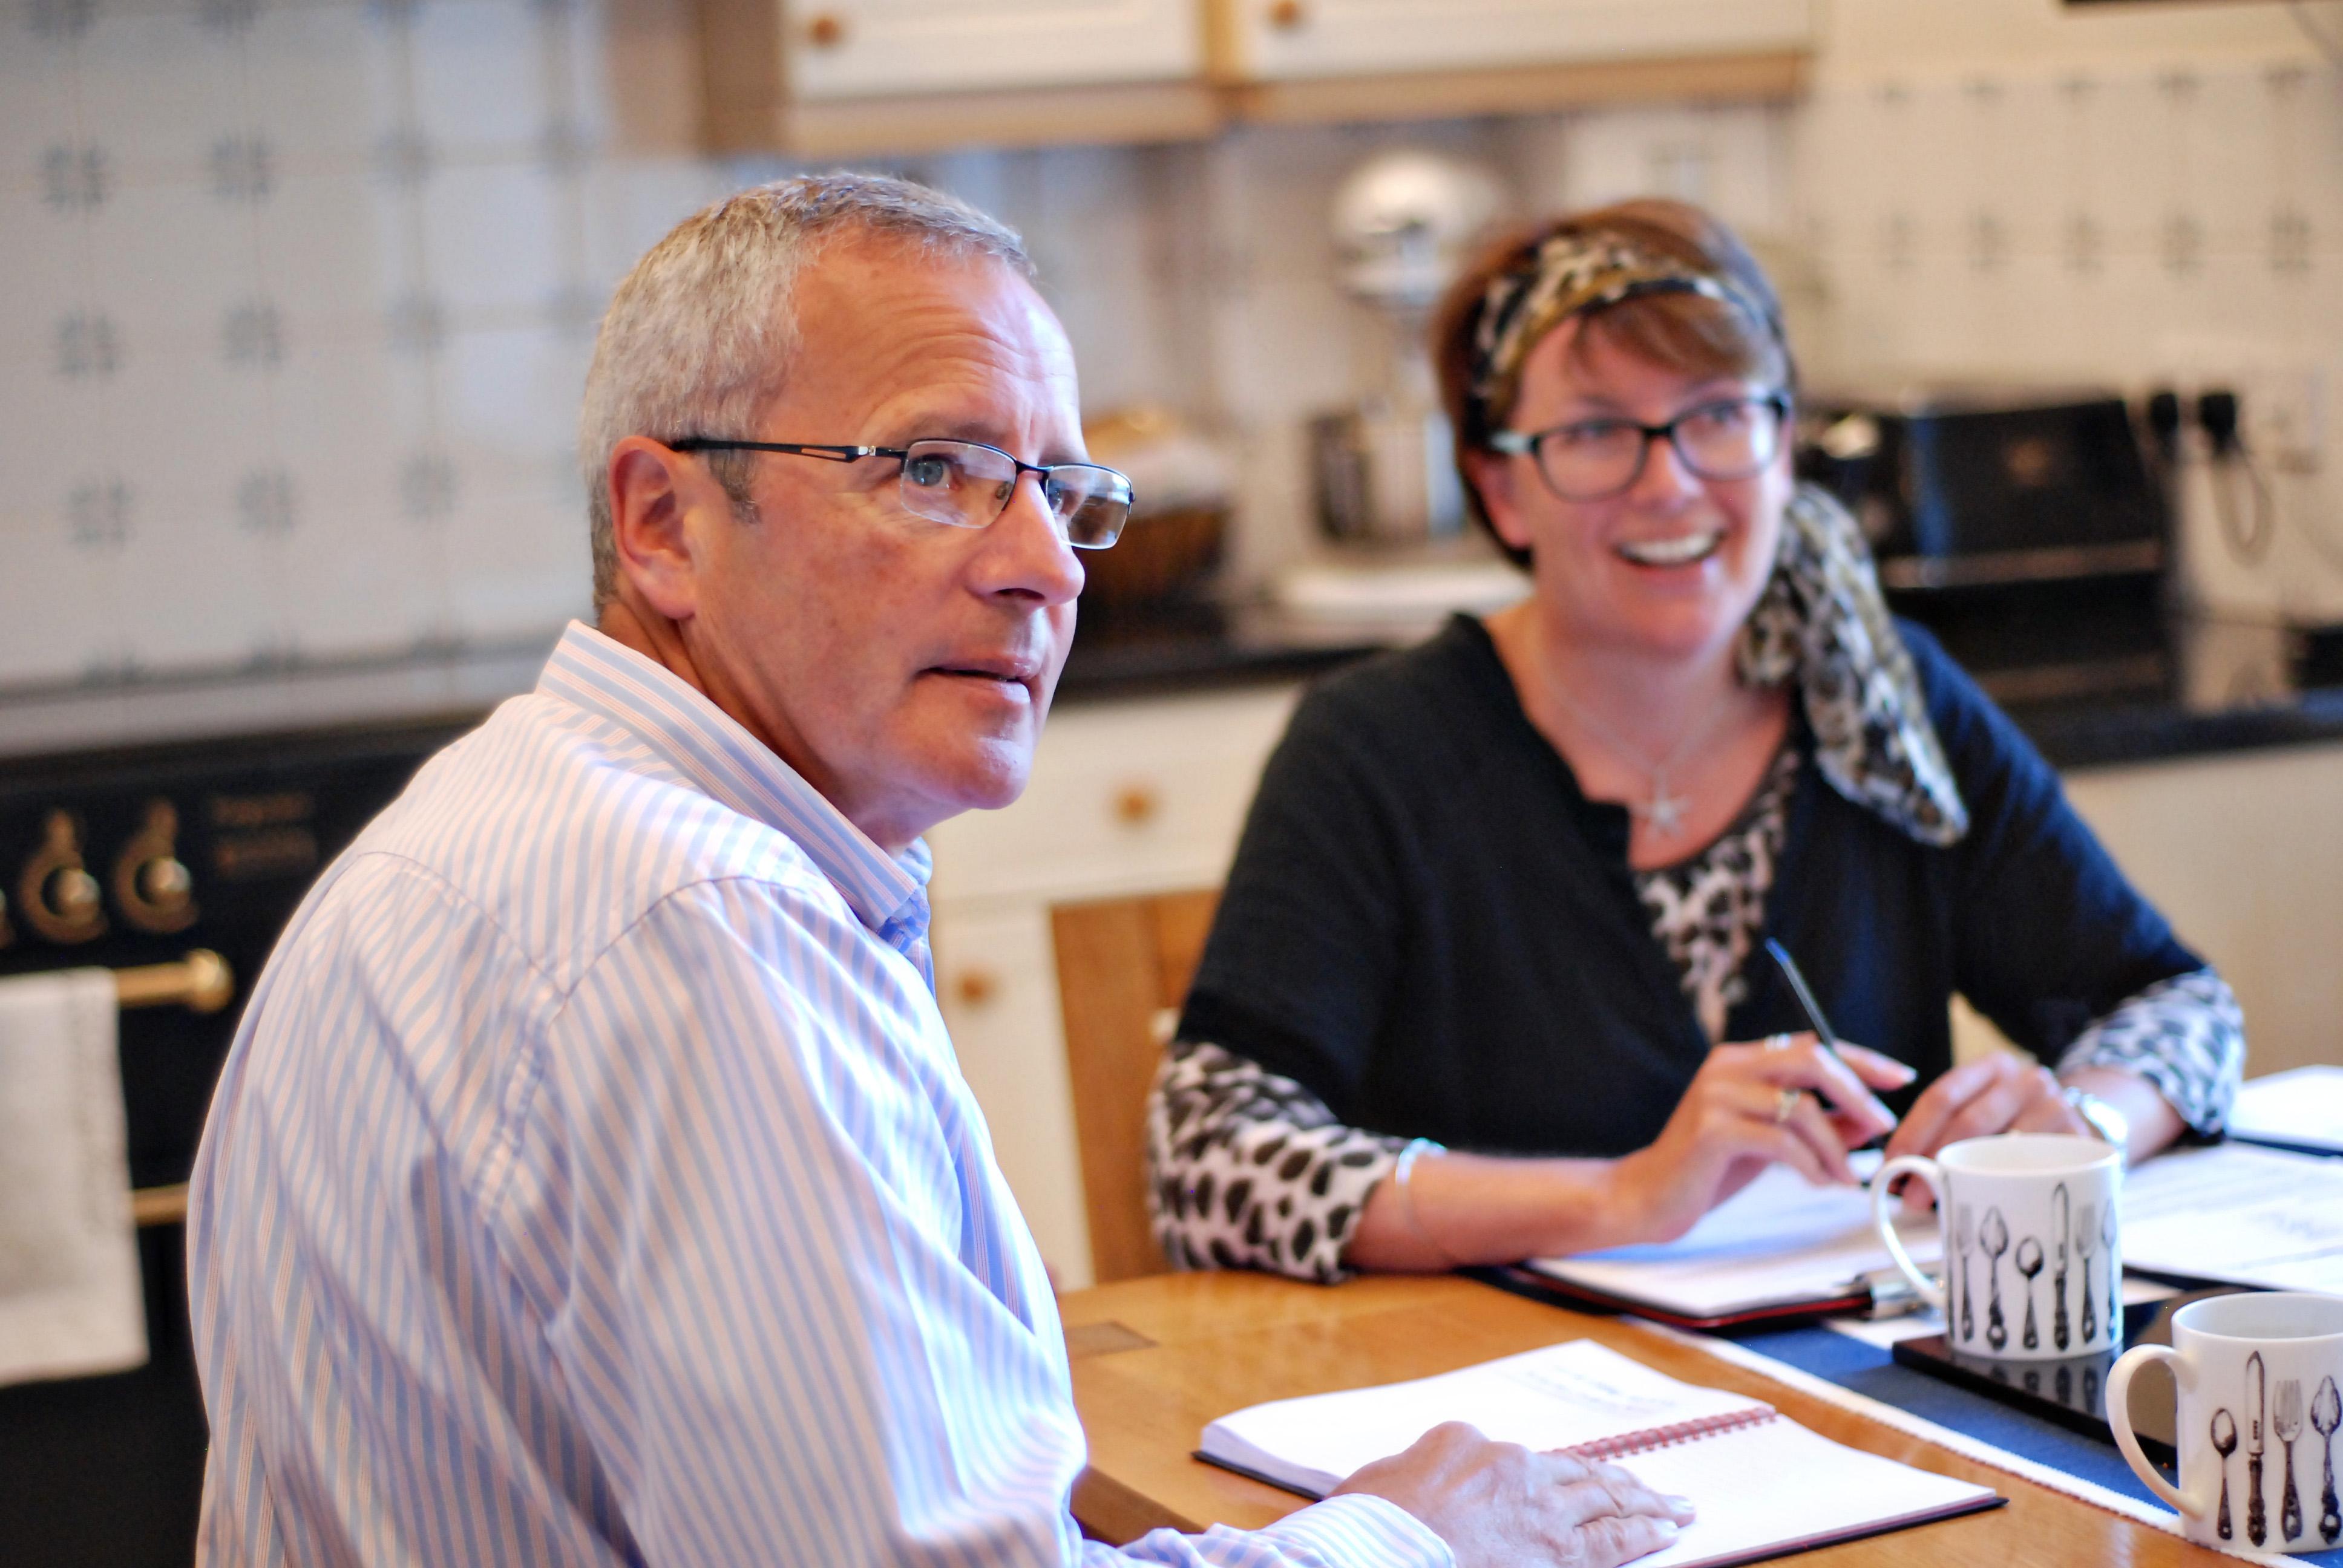 Mentoring service prepares Angels for franchising